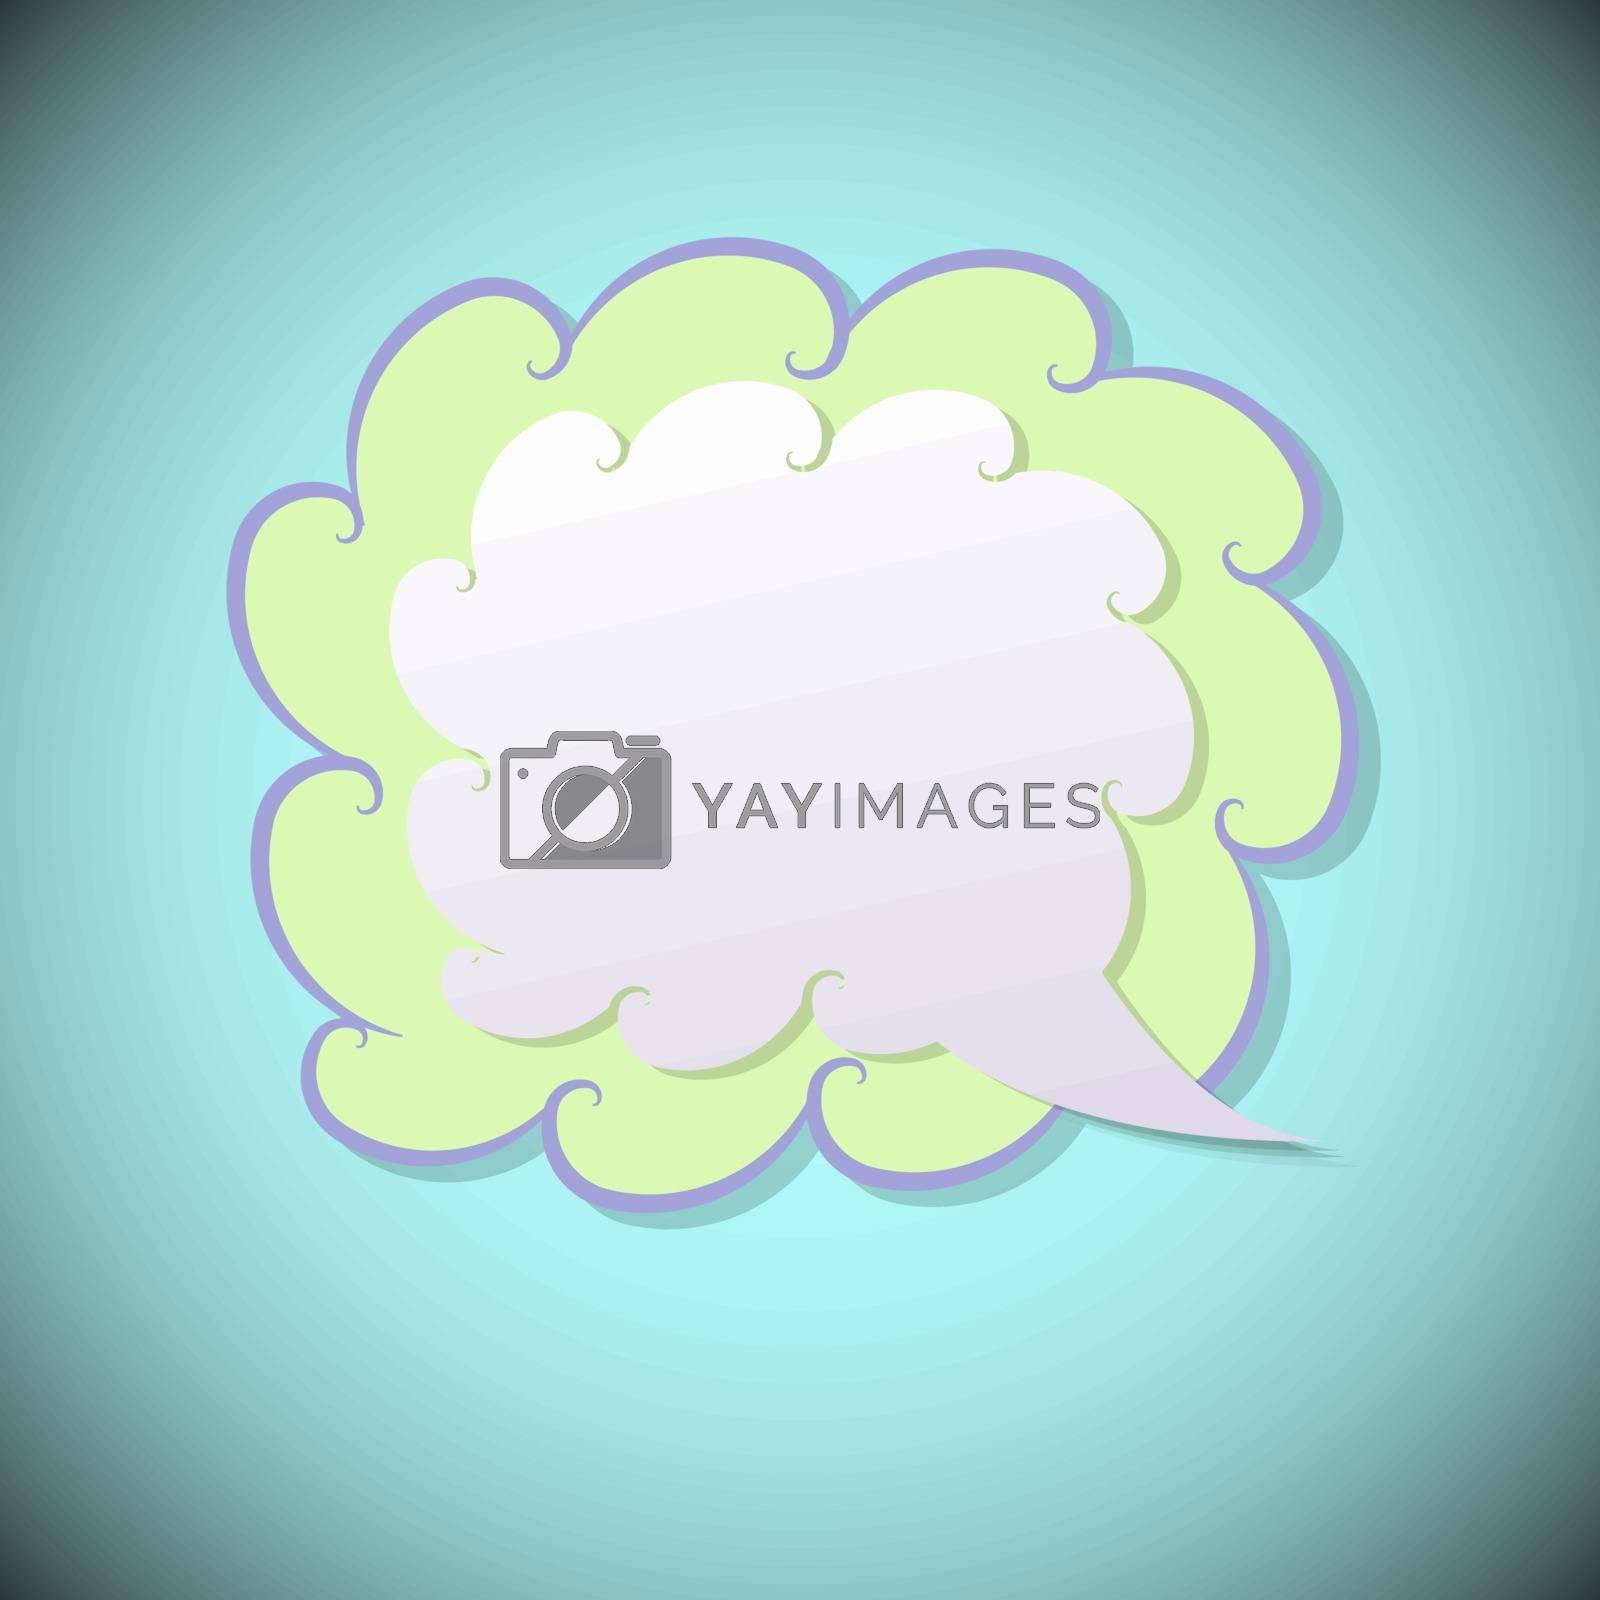 Retro speech bubble on blue background, vector illustration